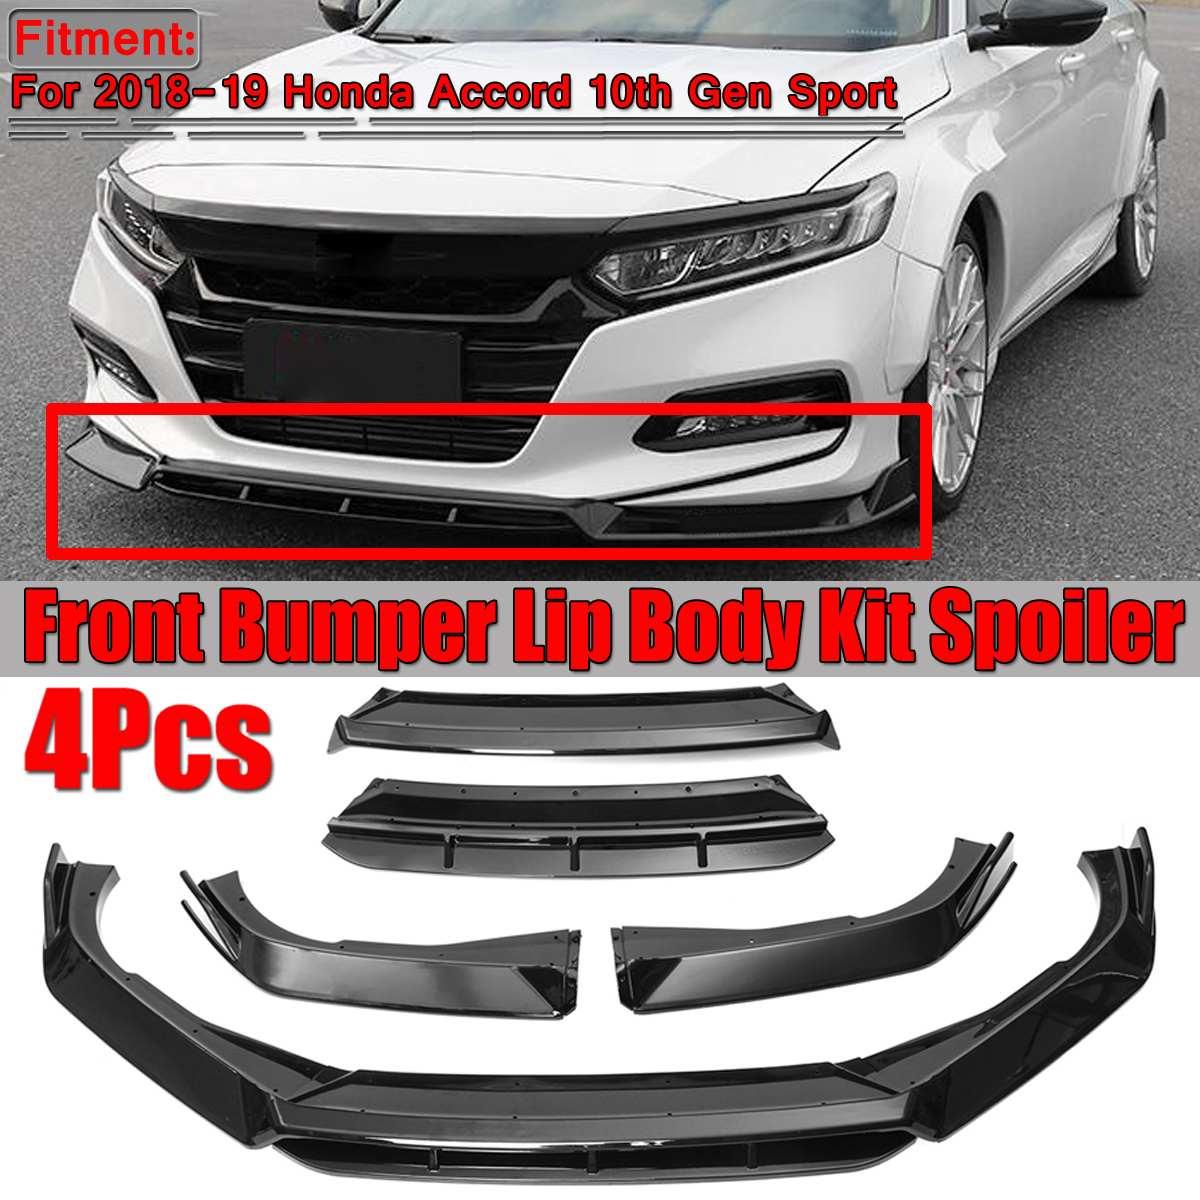 New 4pcs Car Front Bumper Lip Splitter Body Kit Spoiler Splitter Front Bumper Lip For Honda For Accord 10th 2018 2019 Gen Sport